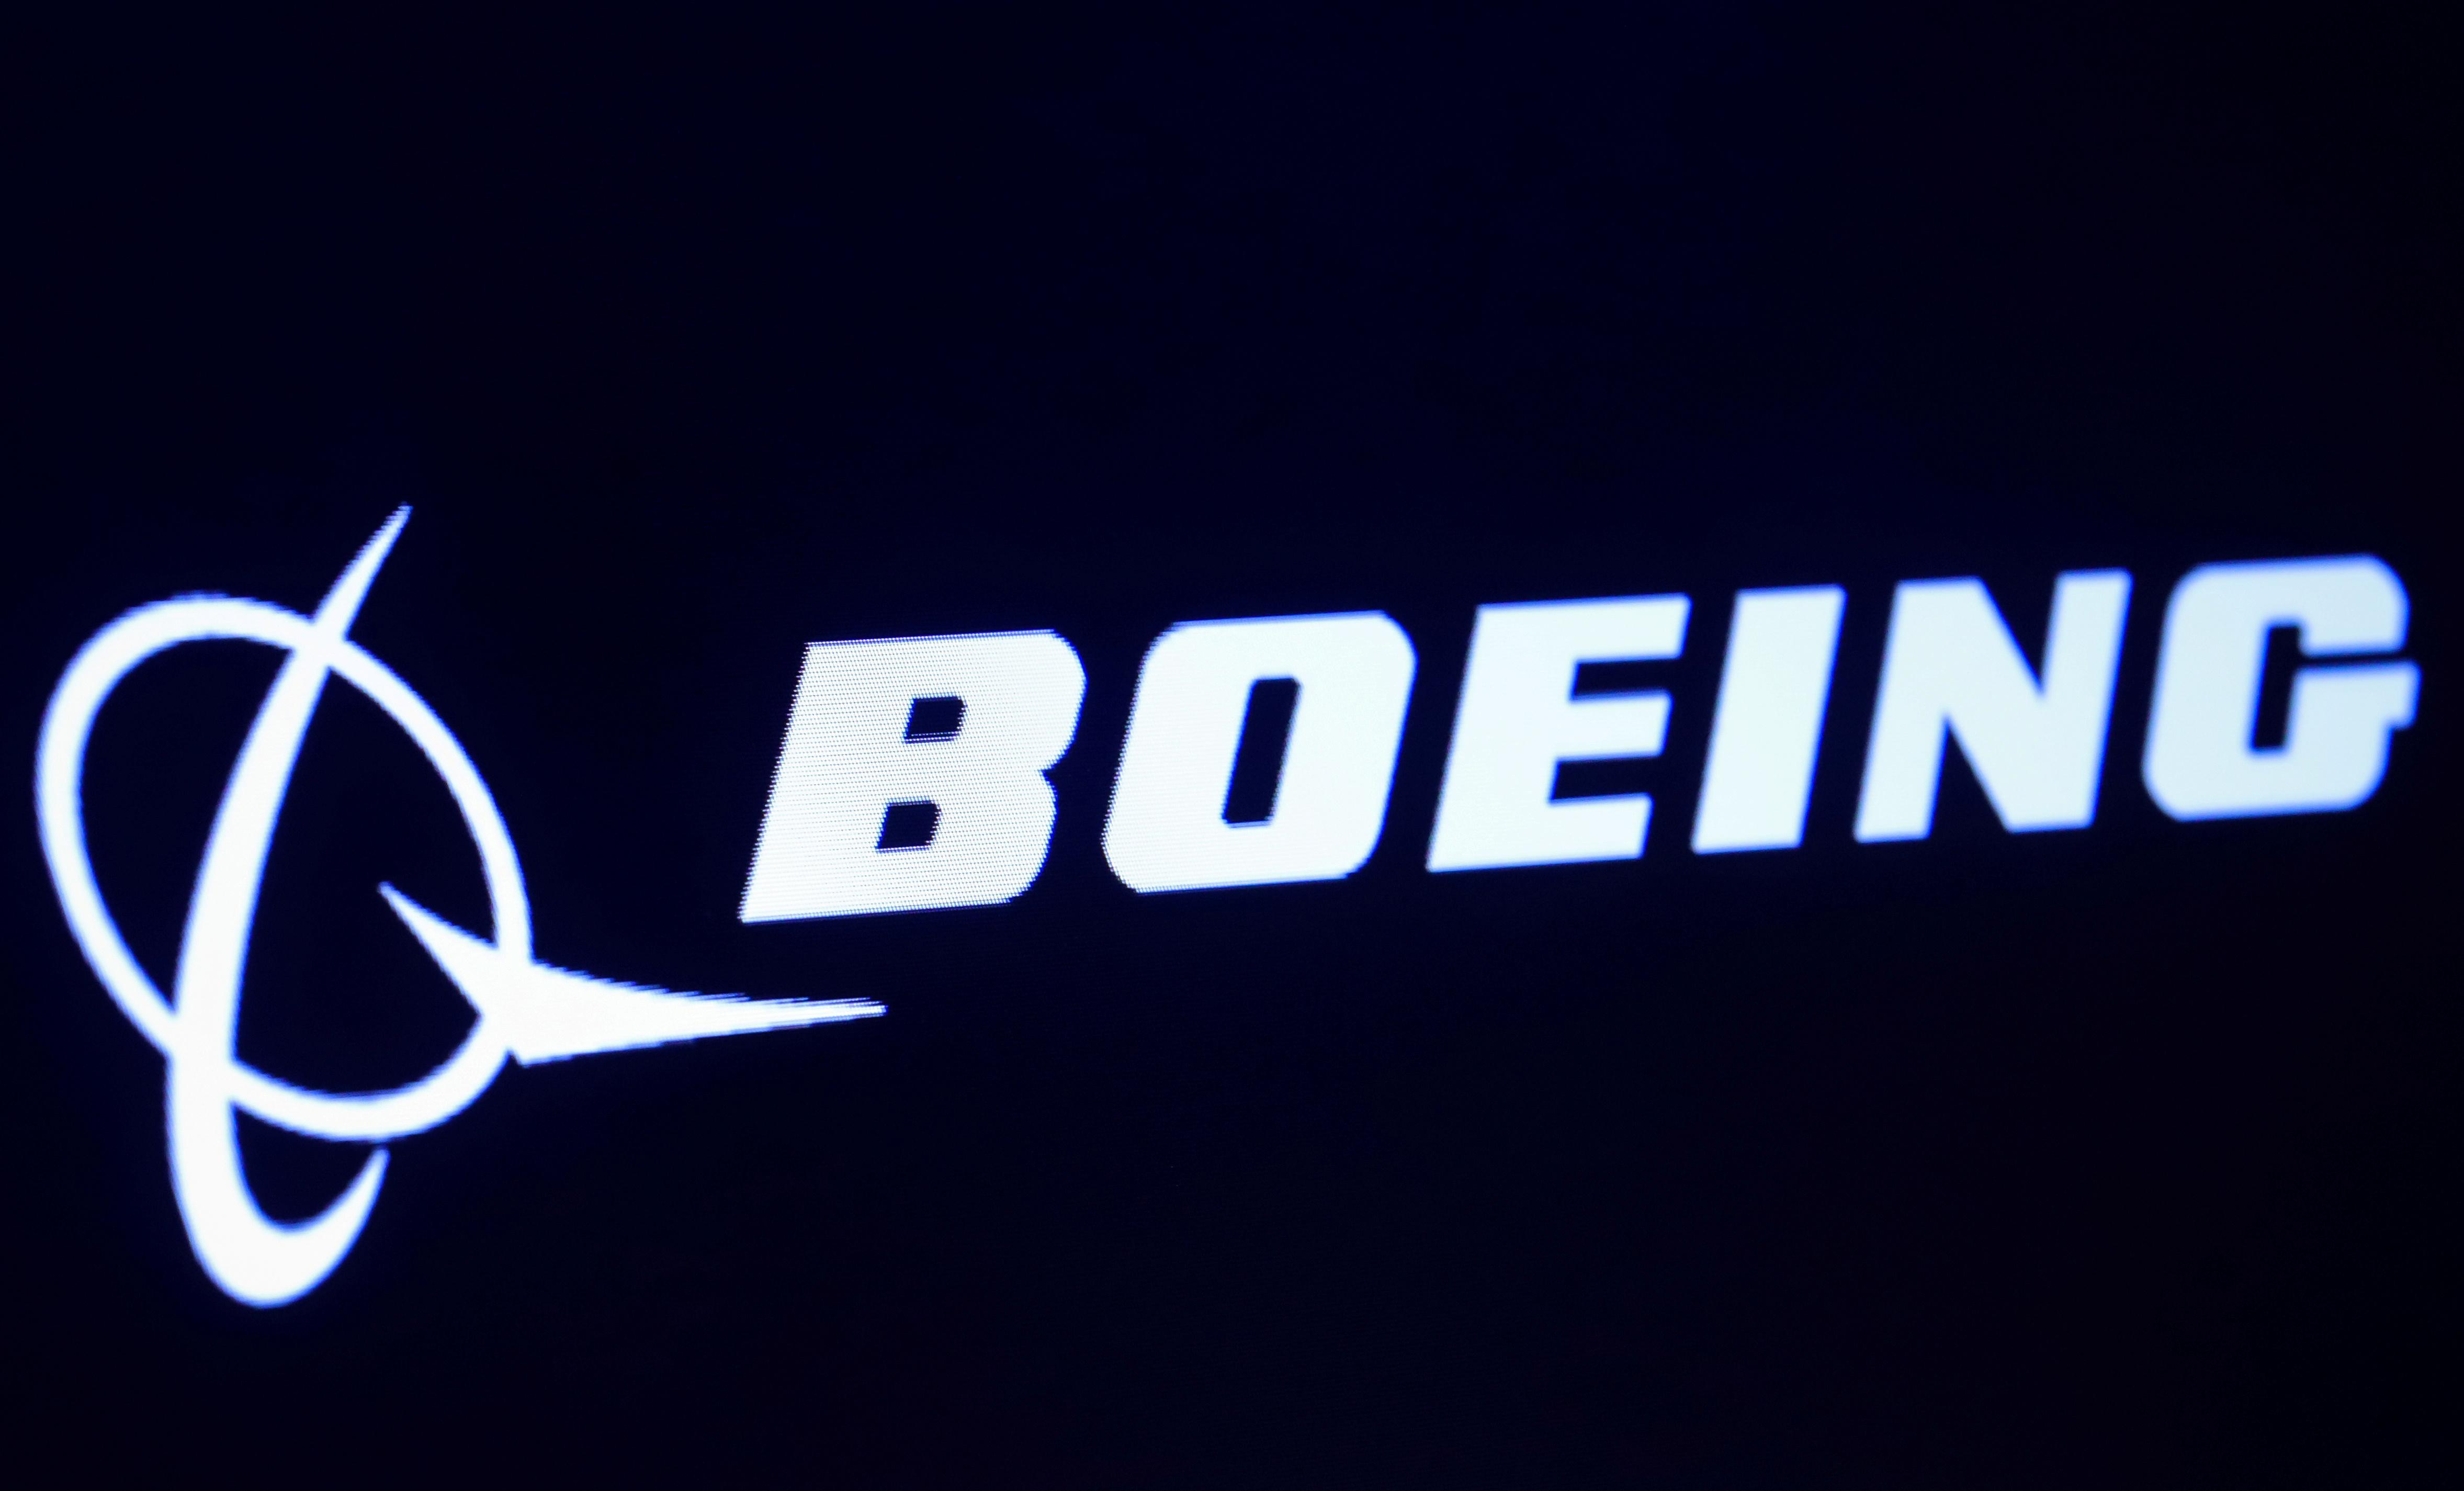 UAE regulator not optimistic on Boeing 737 MAX return this year